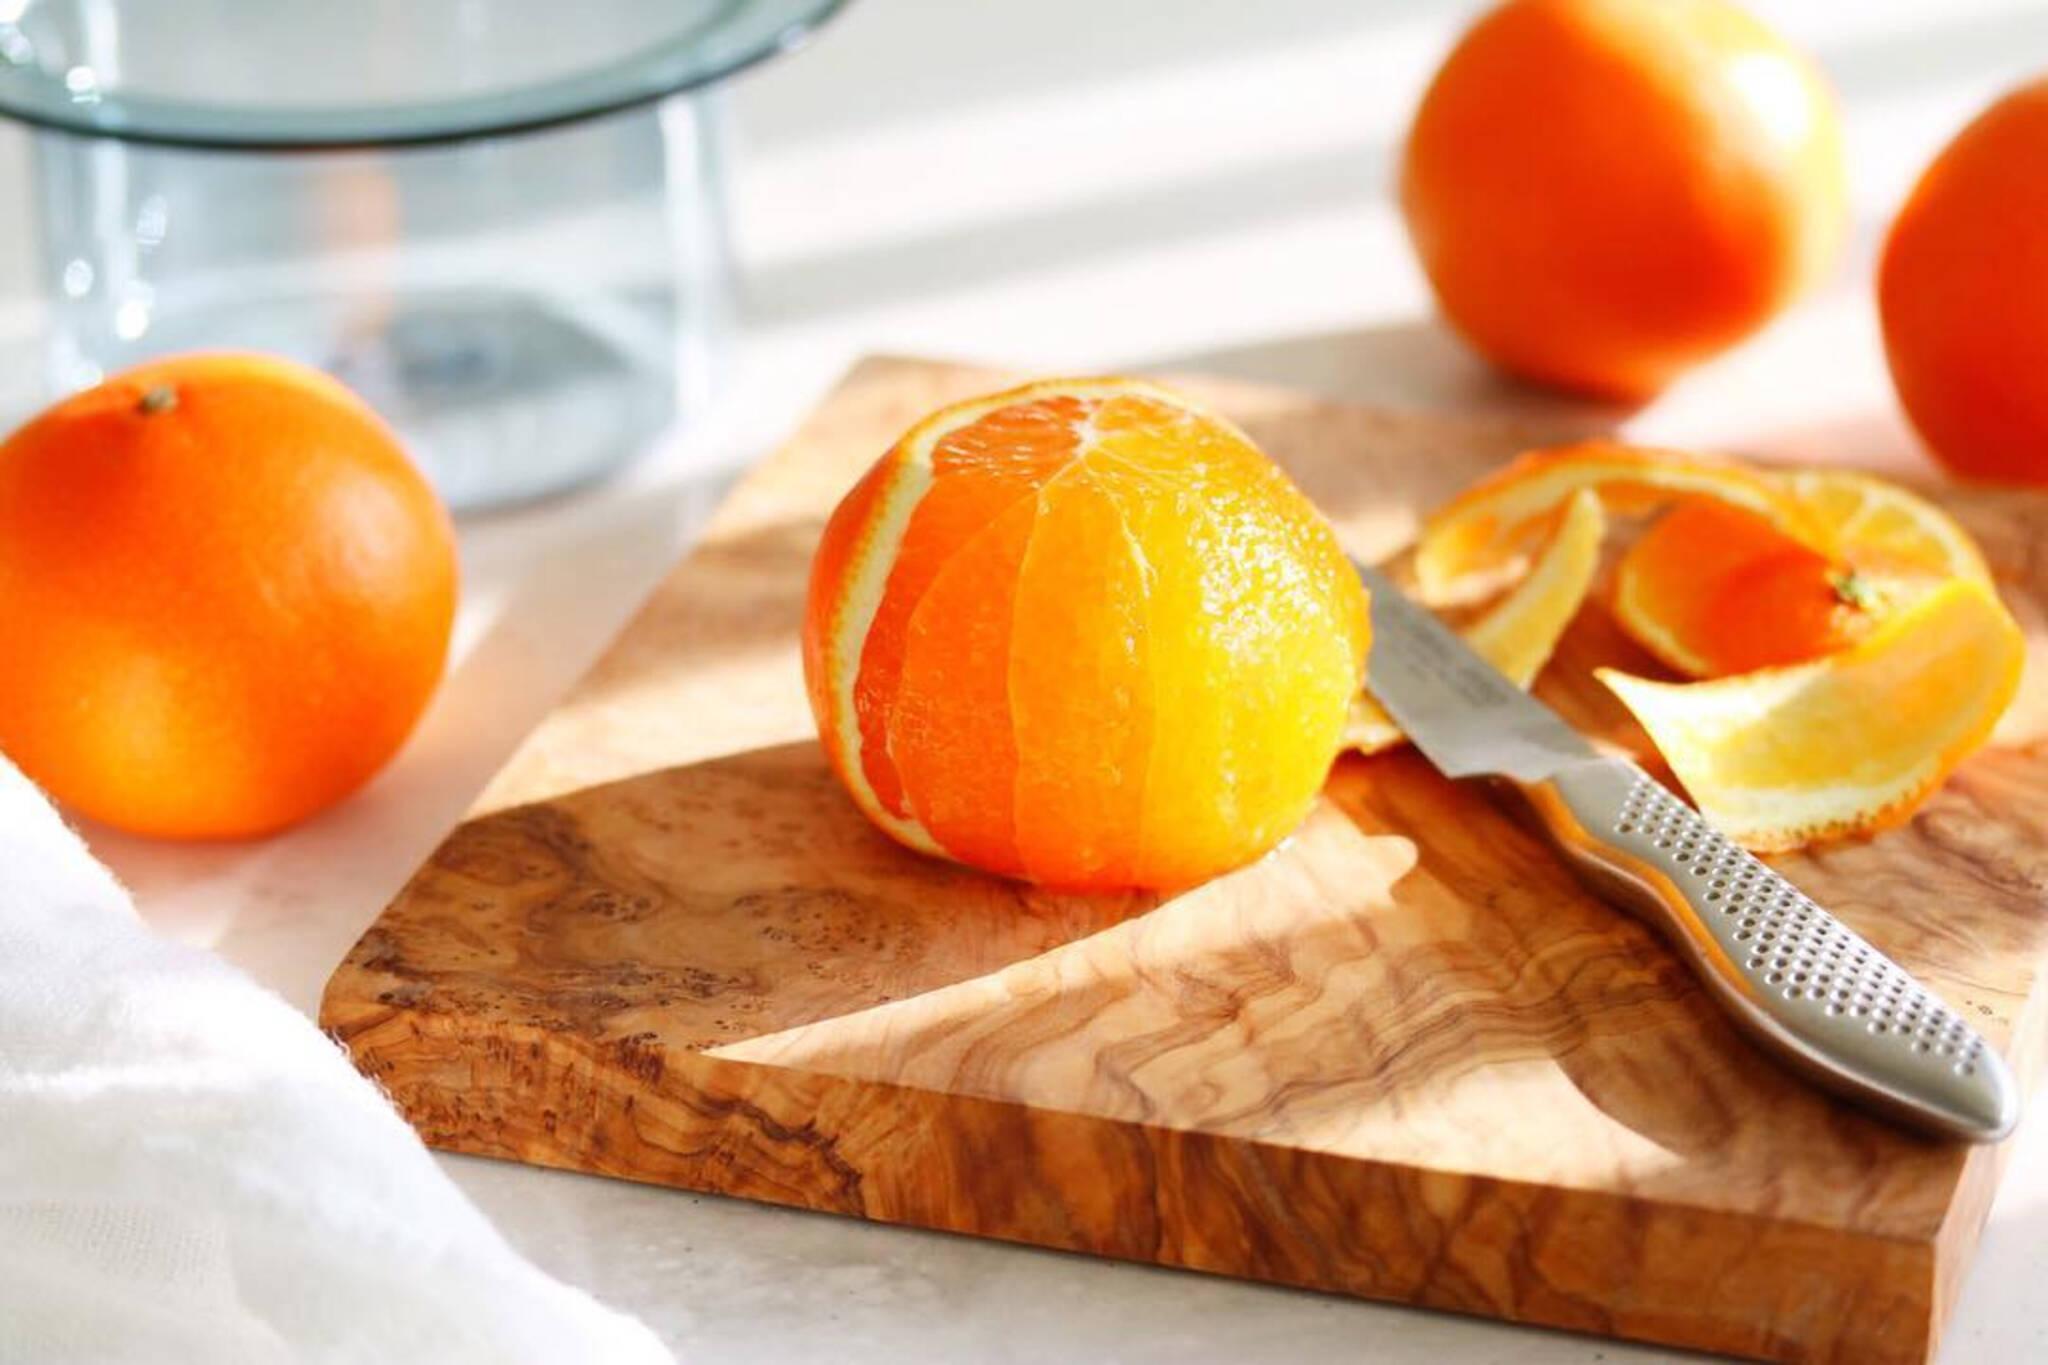 Beni Madonna orange toronto